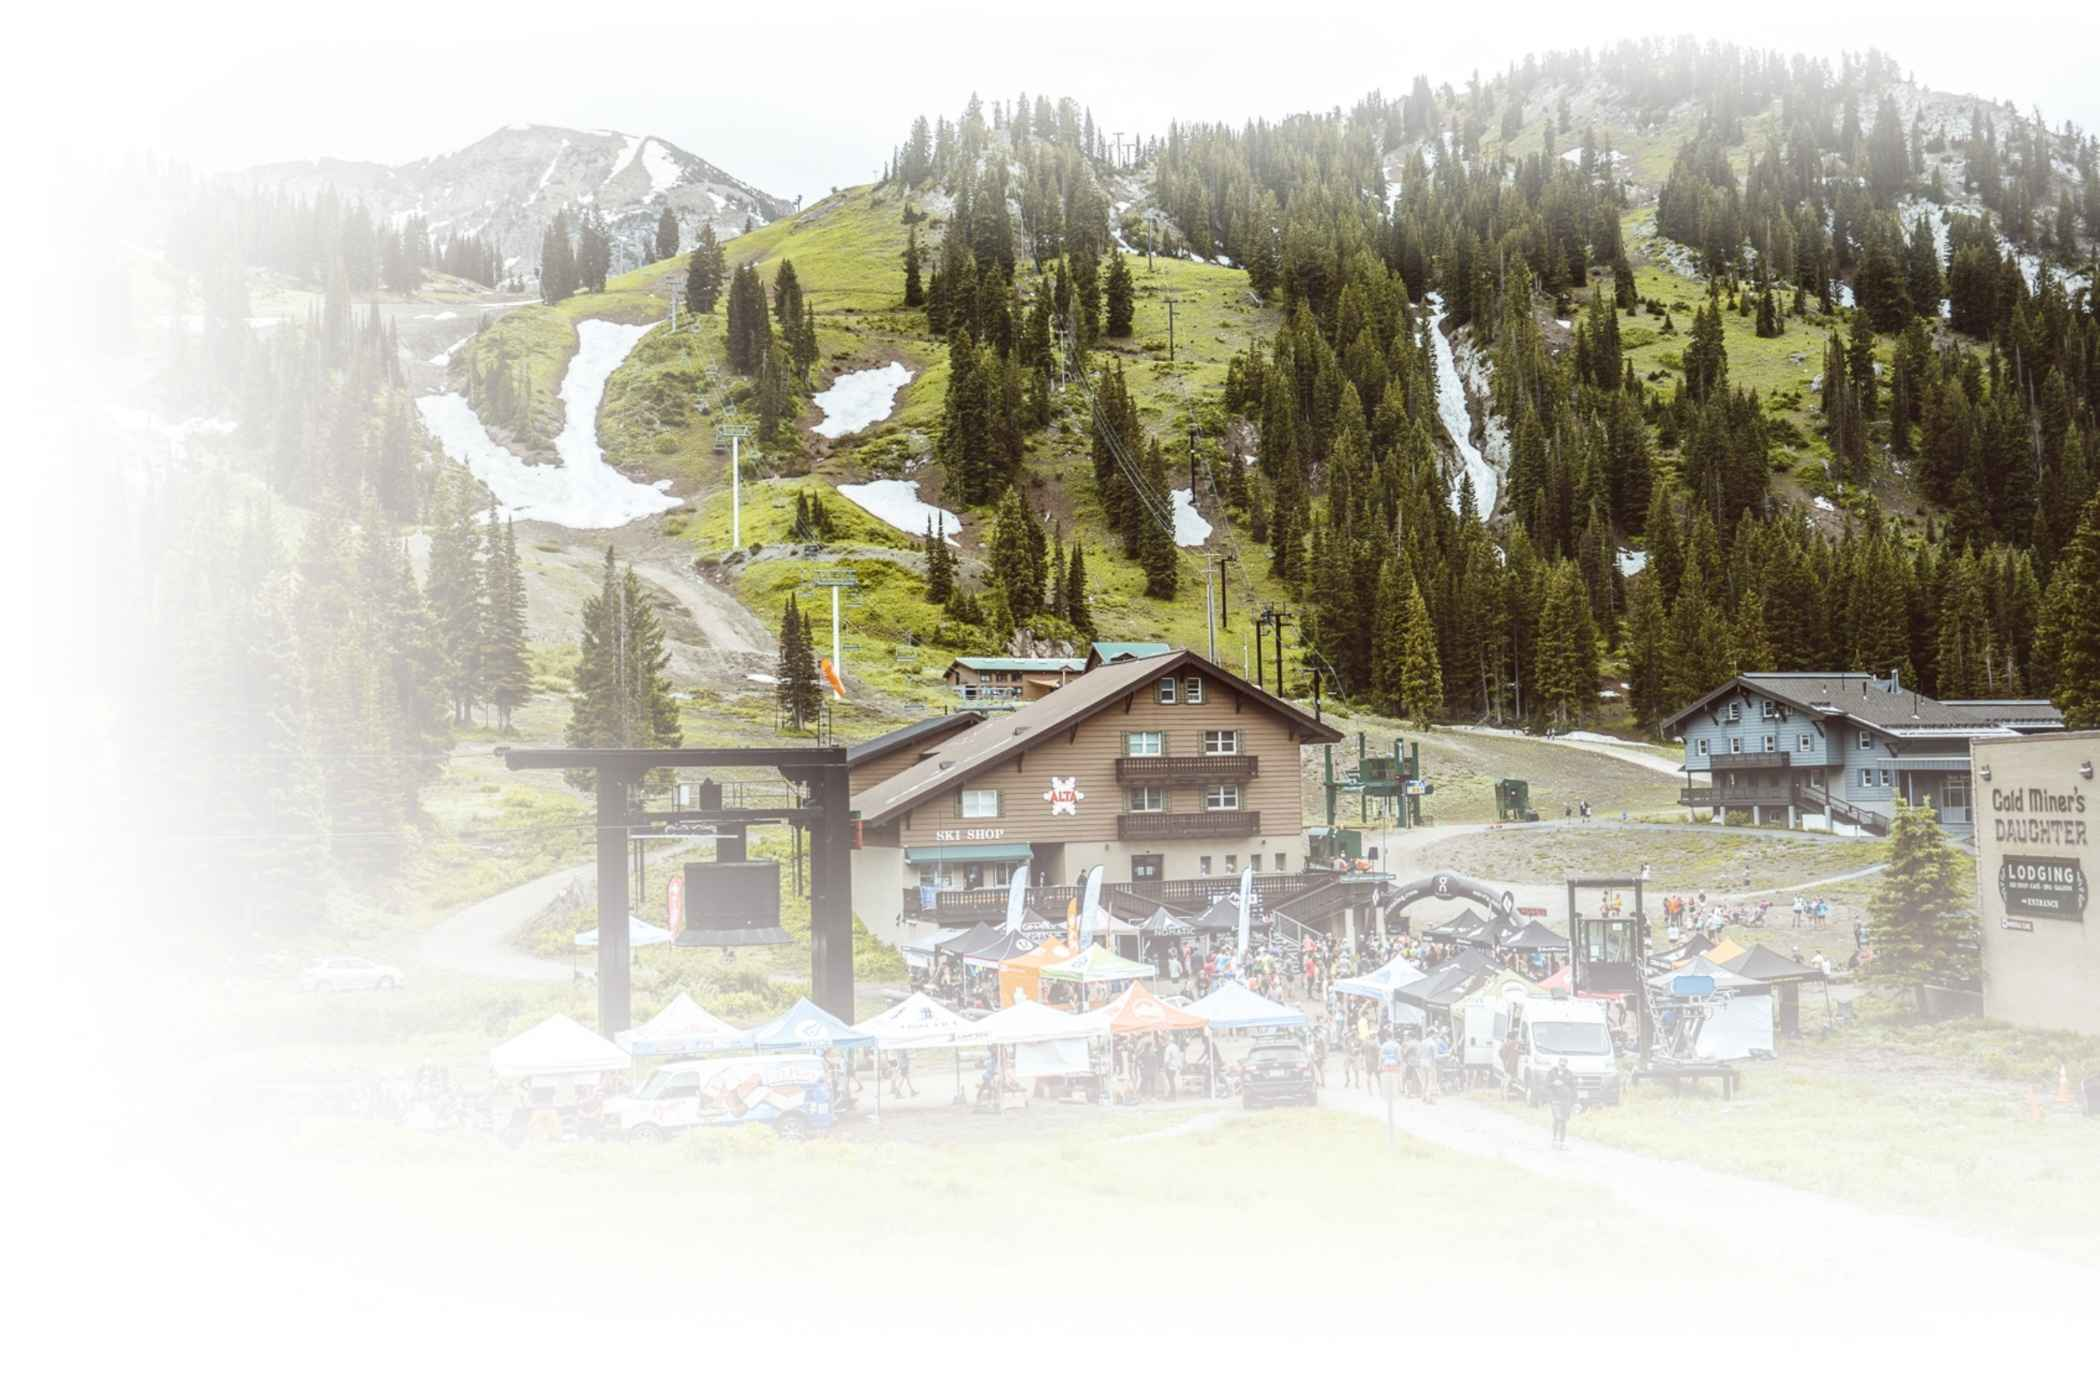 Cirque Series vendor village on a summer day at Alta Ski Area